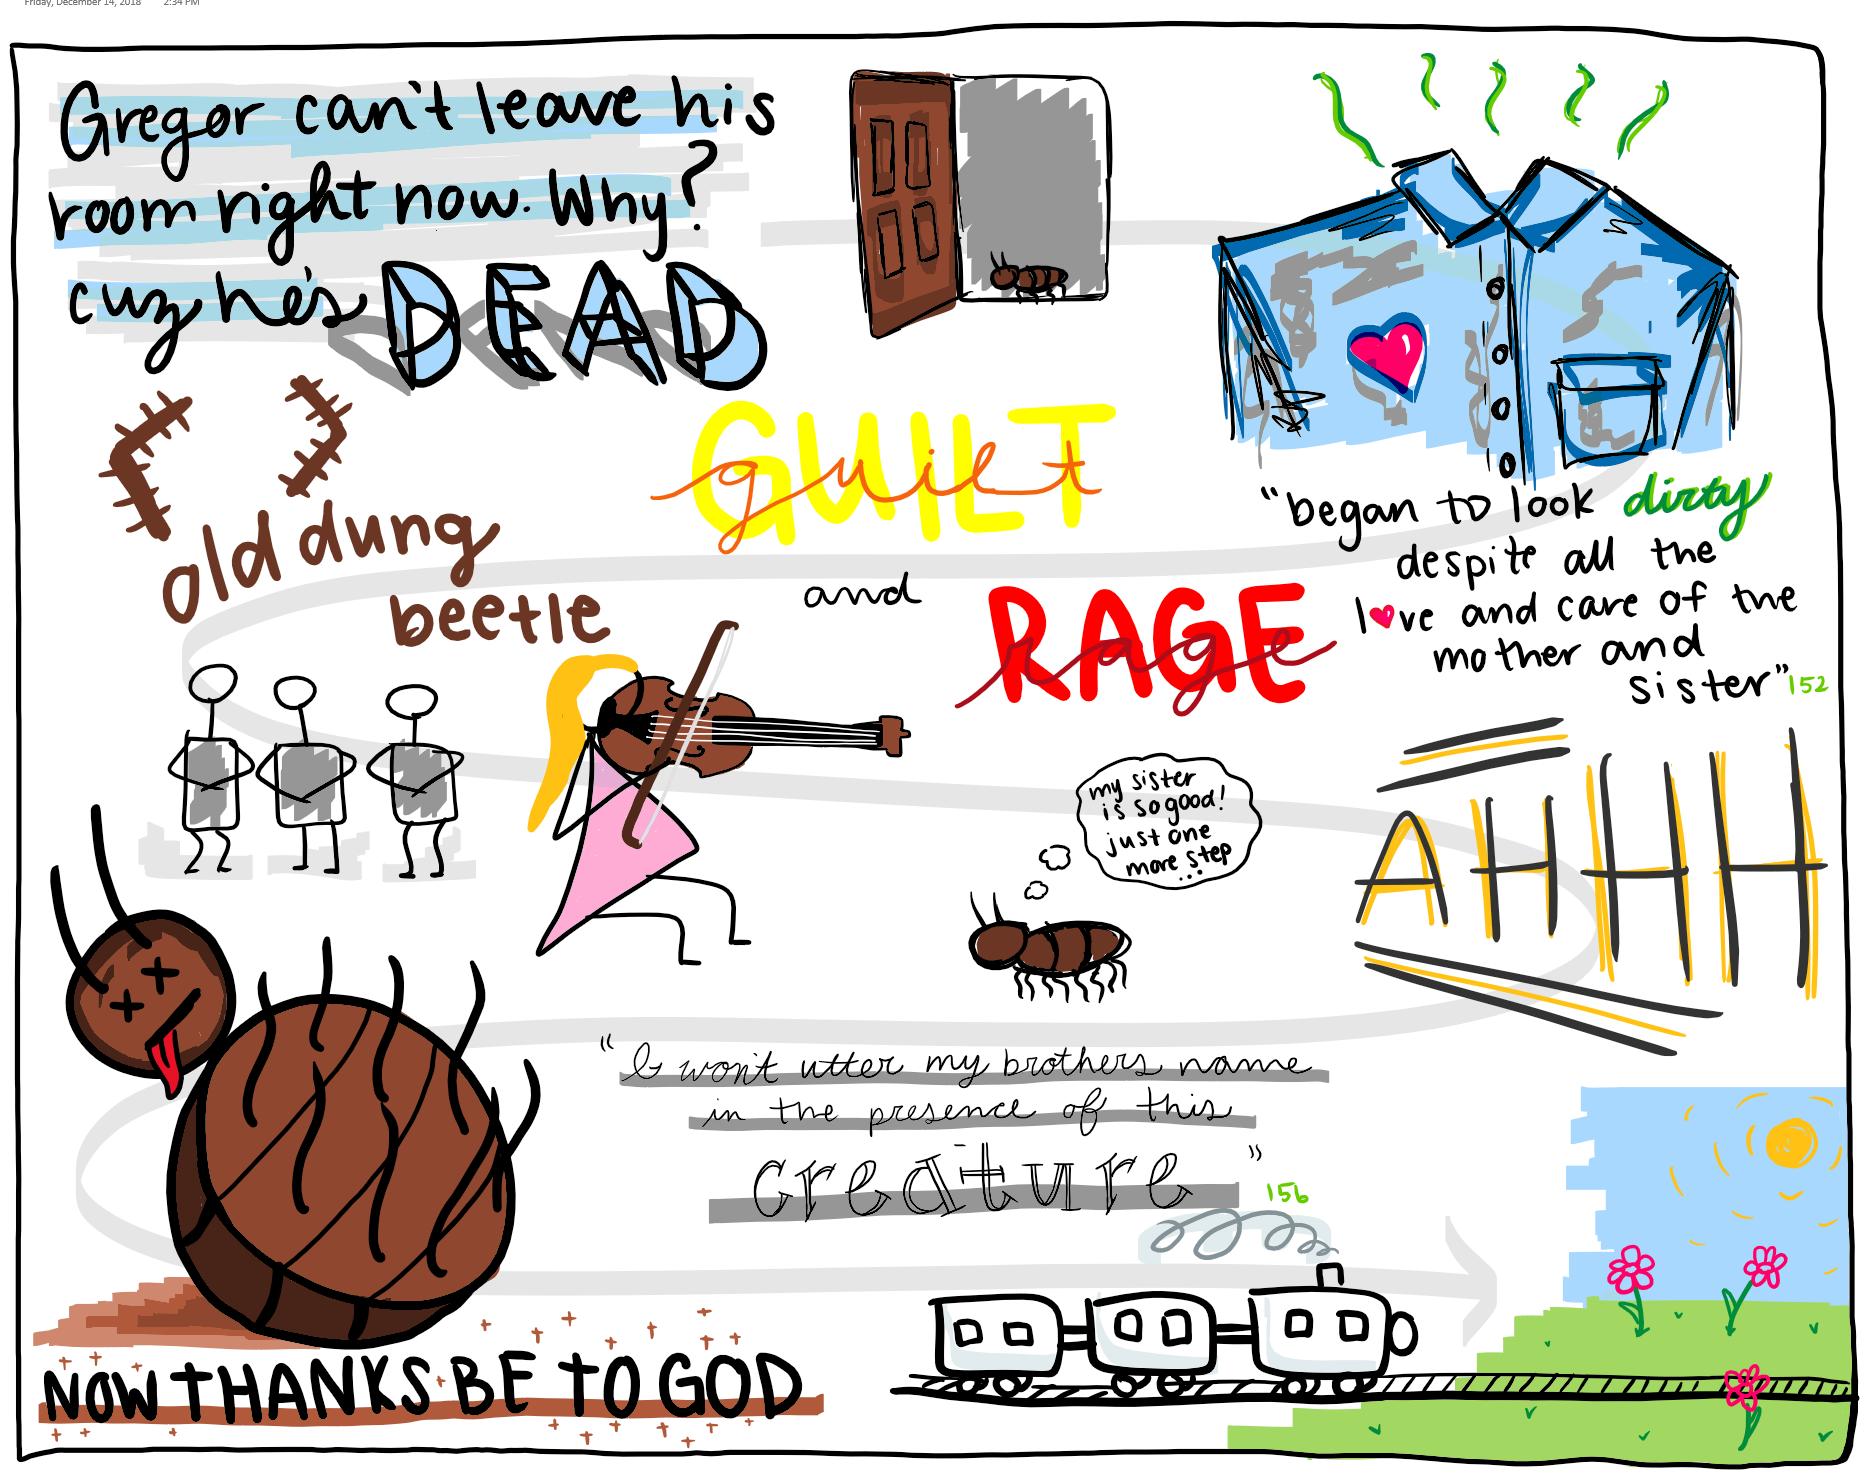 Metamorphosis Part 3 sketchnote by Kendall S. (12th grade).